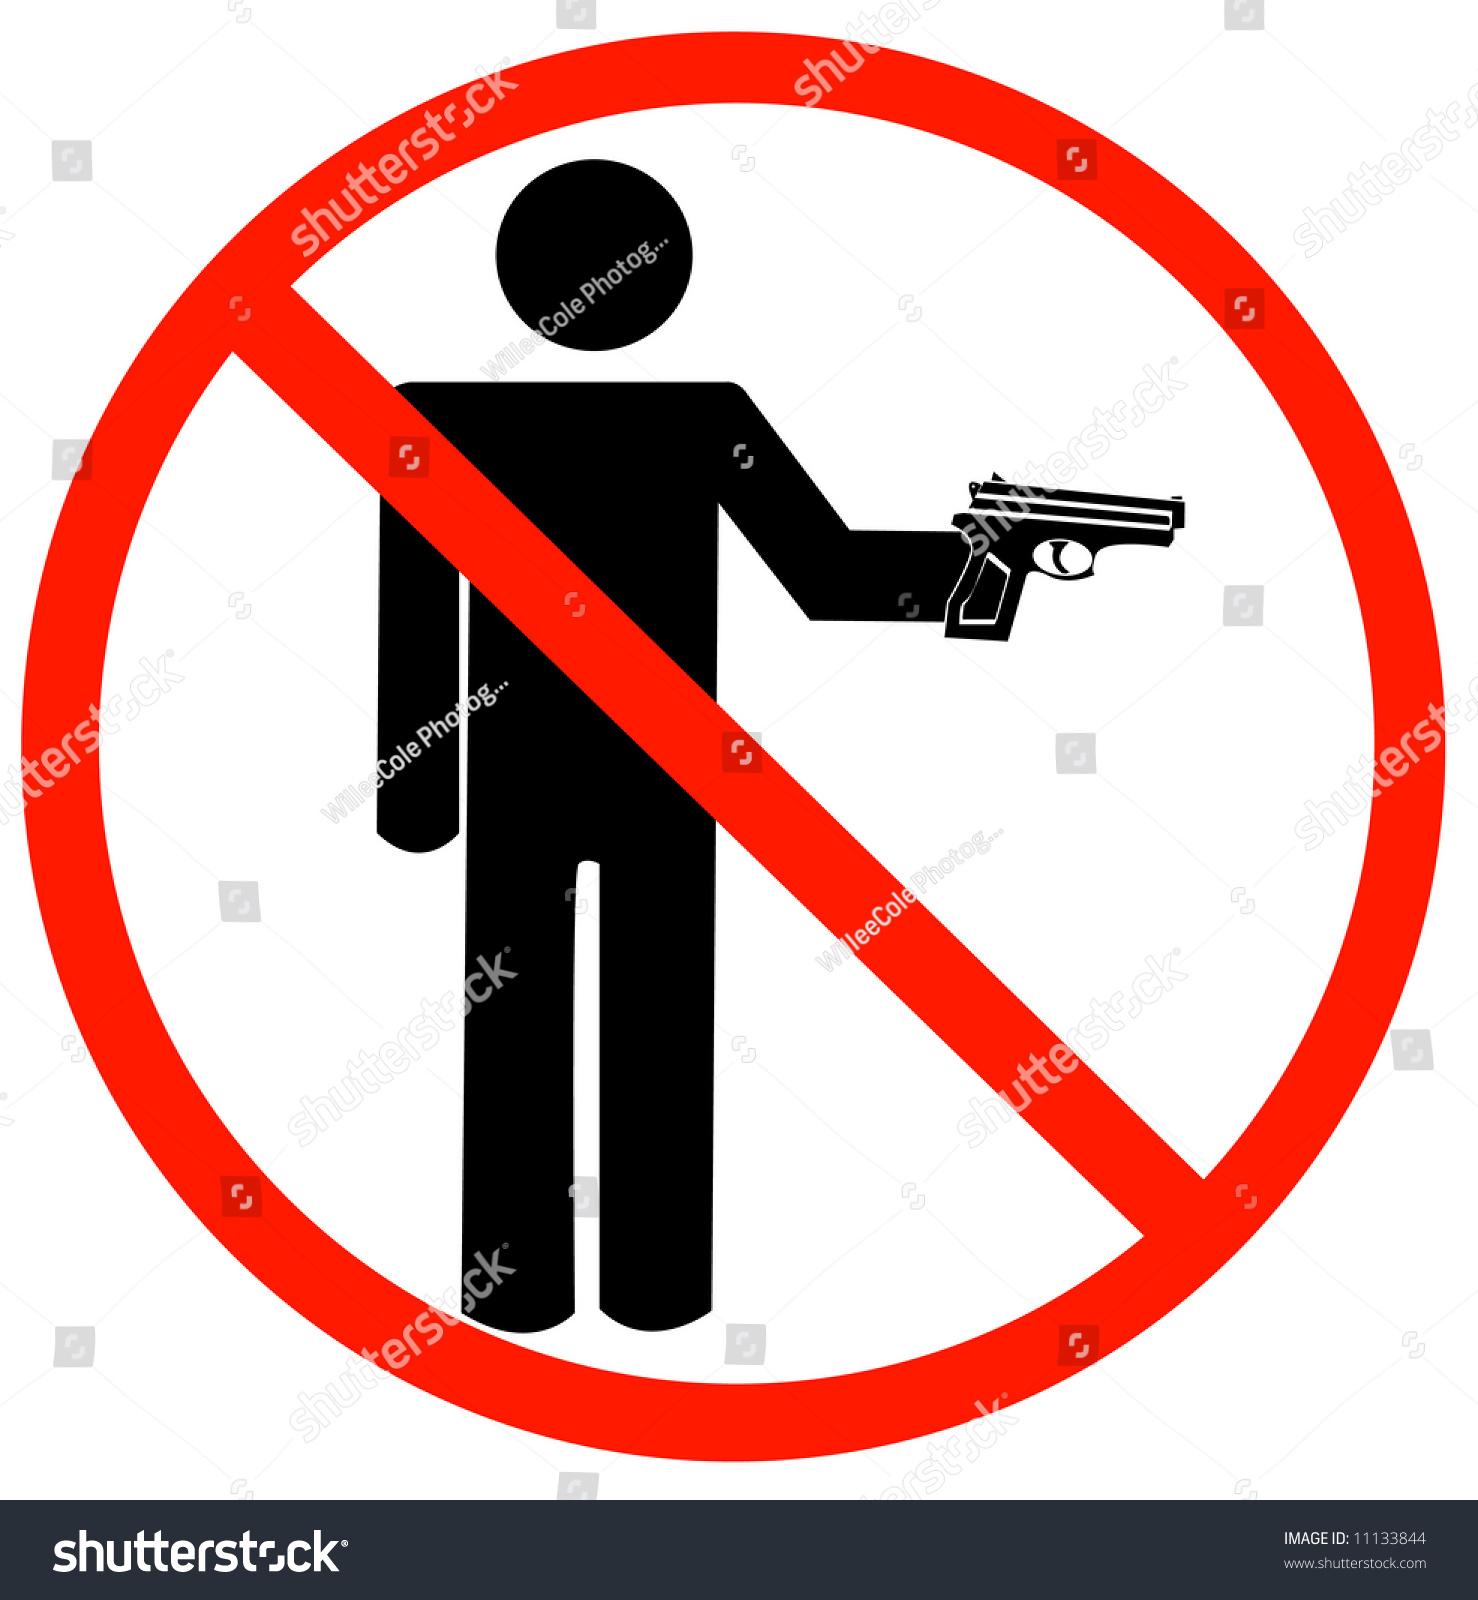 Man holding gun not allowed symbol stock illustration 11133844 man holding gun with not allowed symbol guns prohibited biocorpaavc